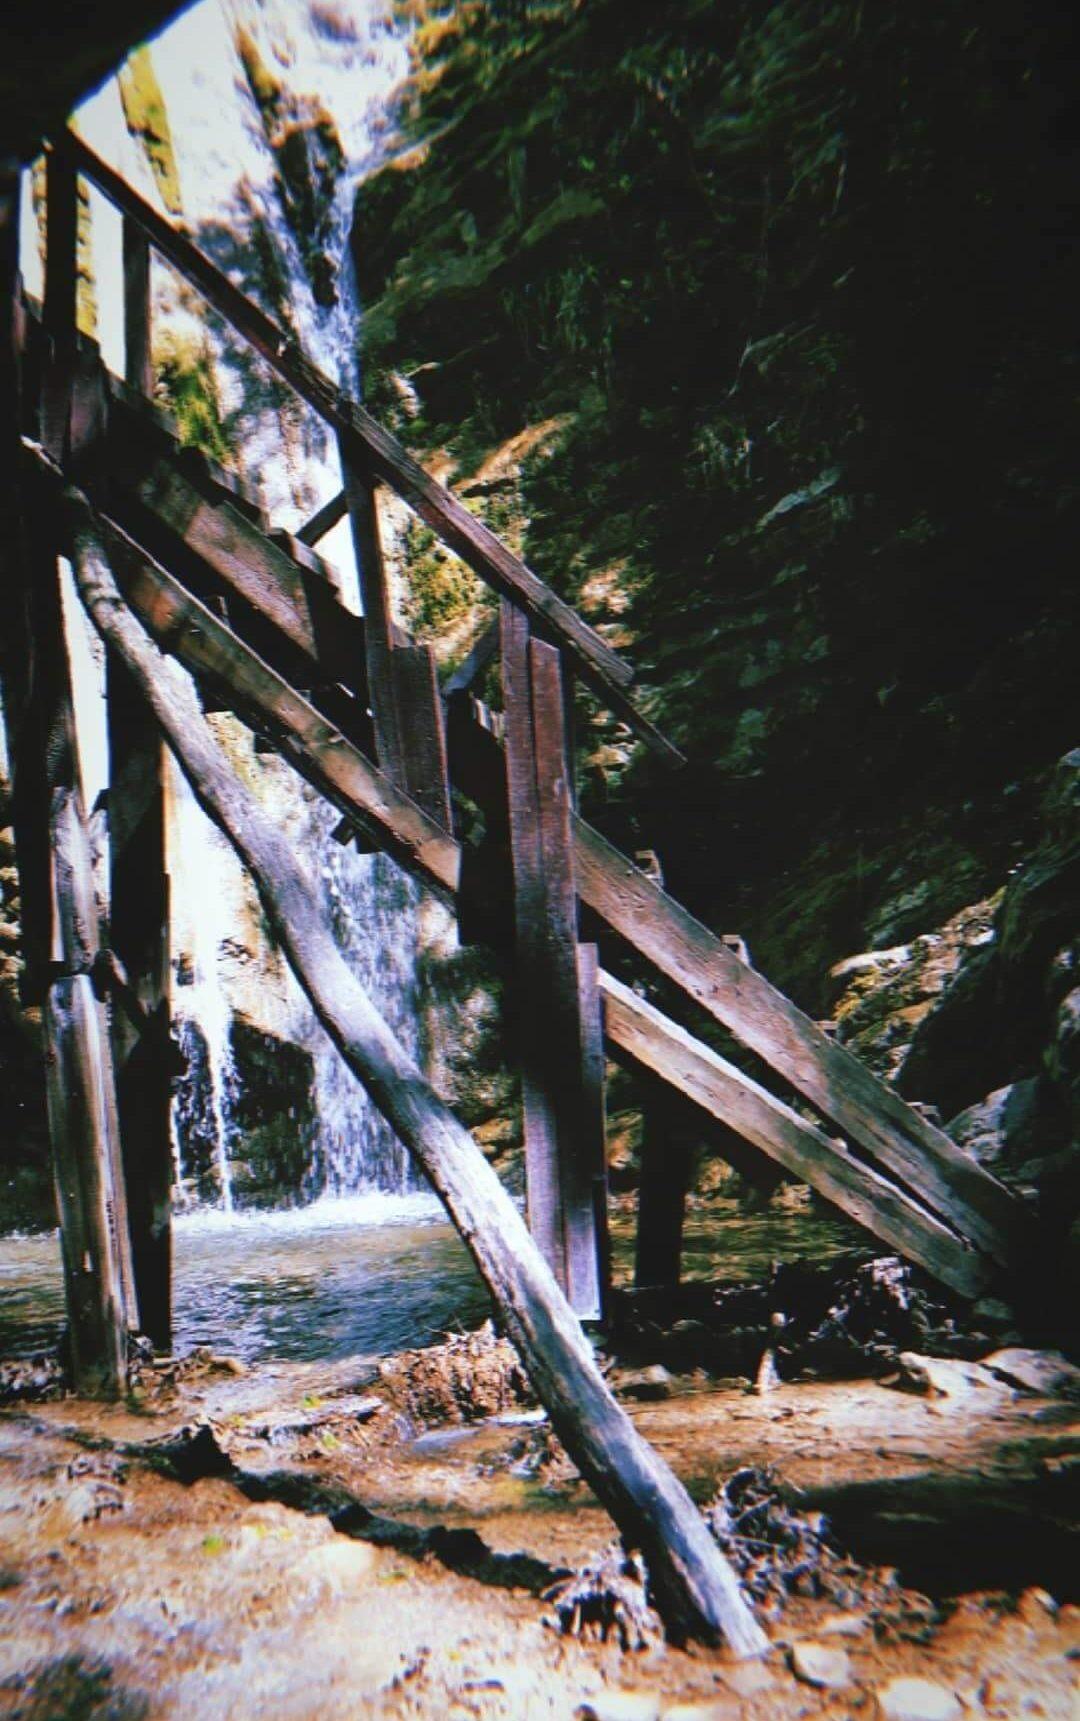 Как дойти до Гебиусских водопадов (маршрут)